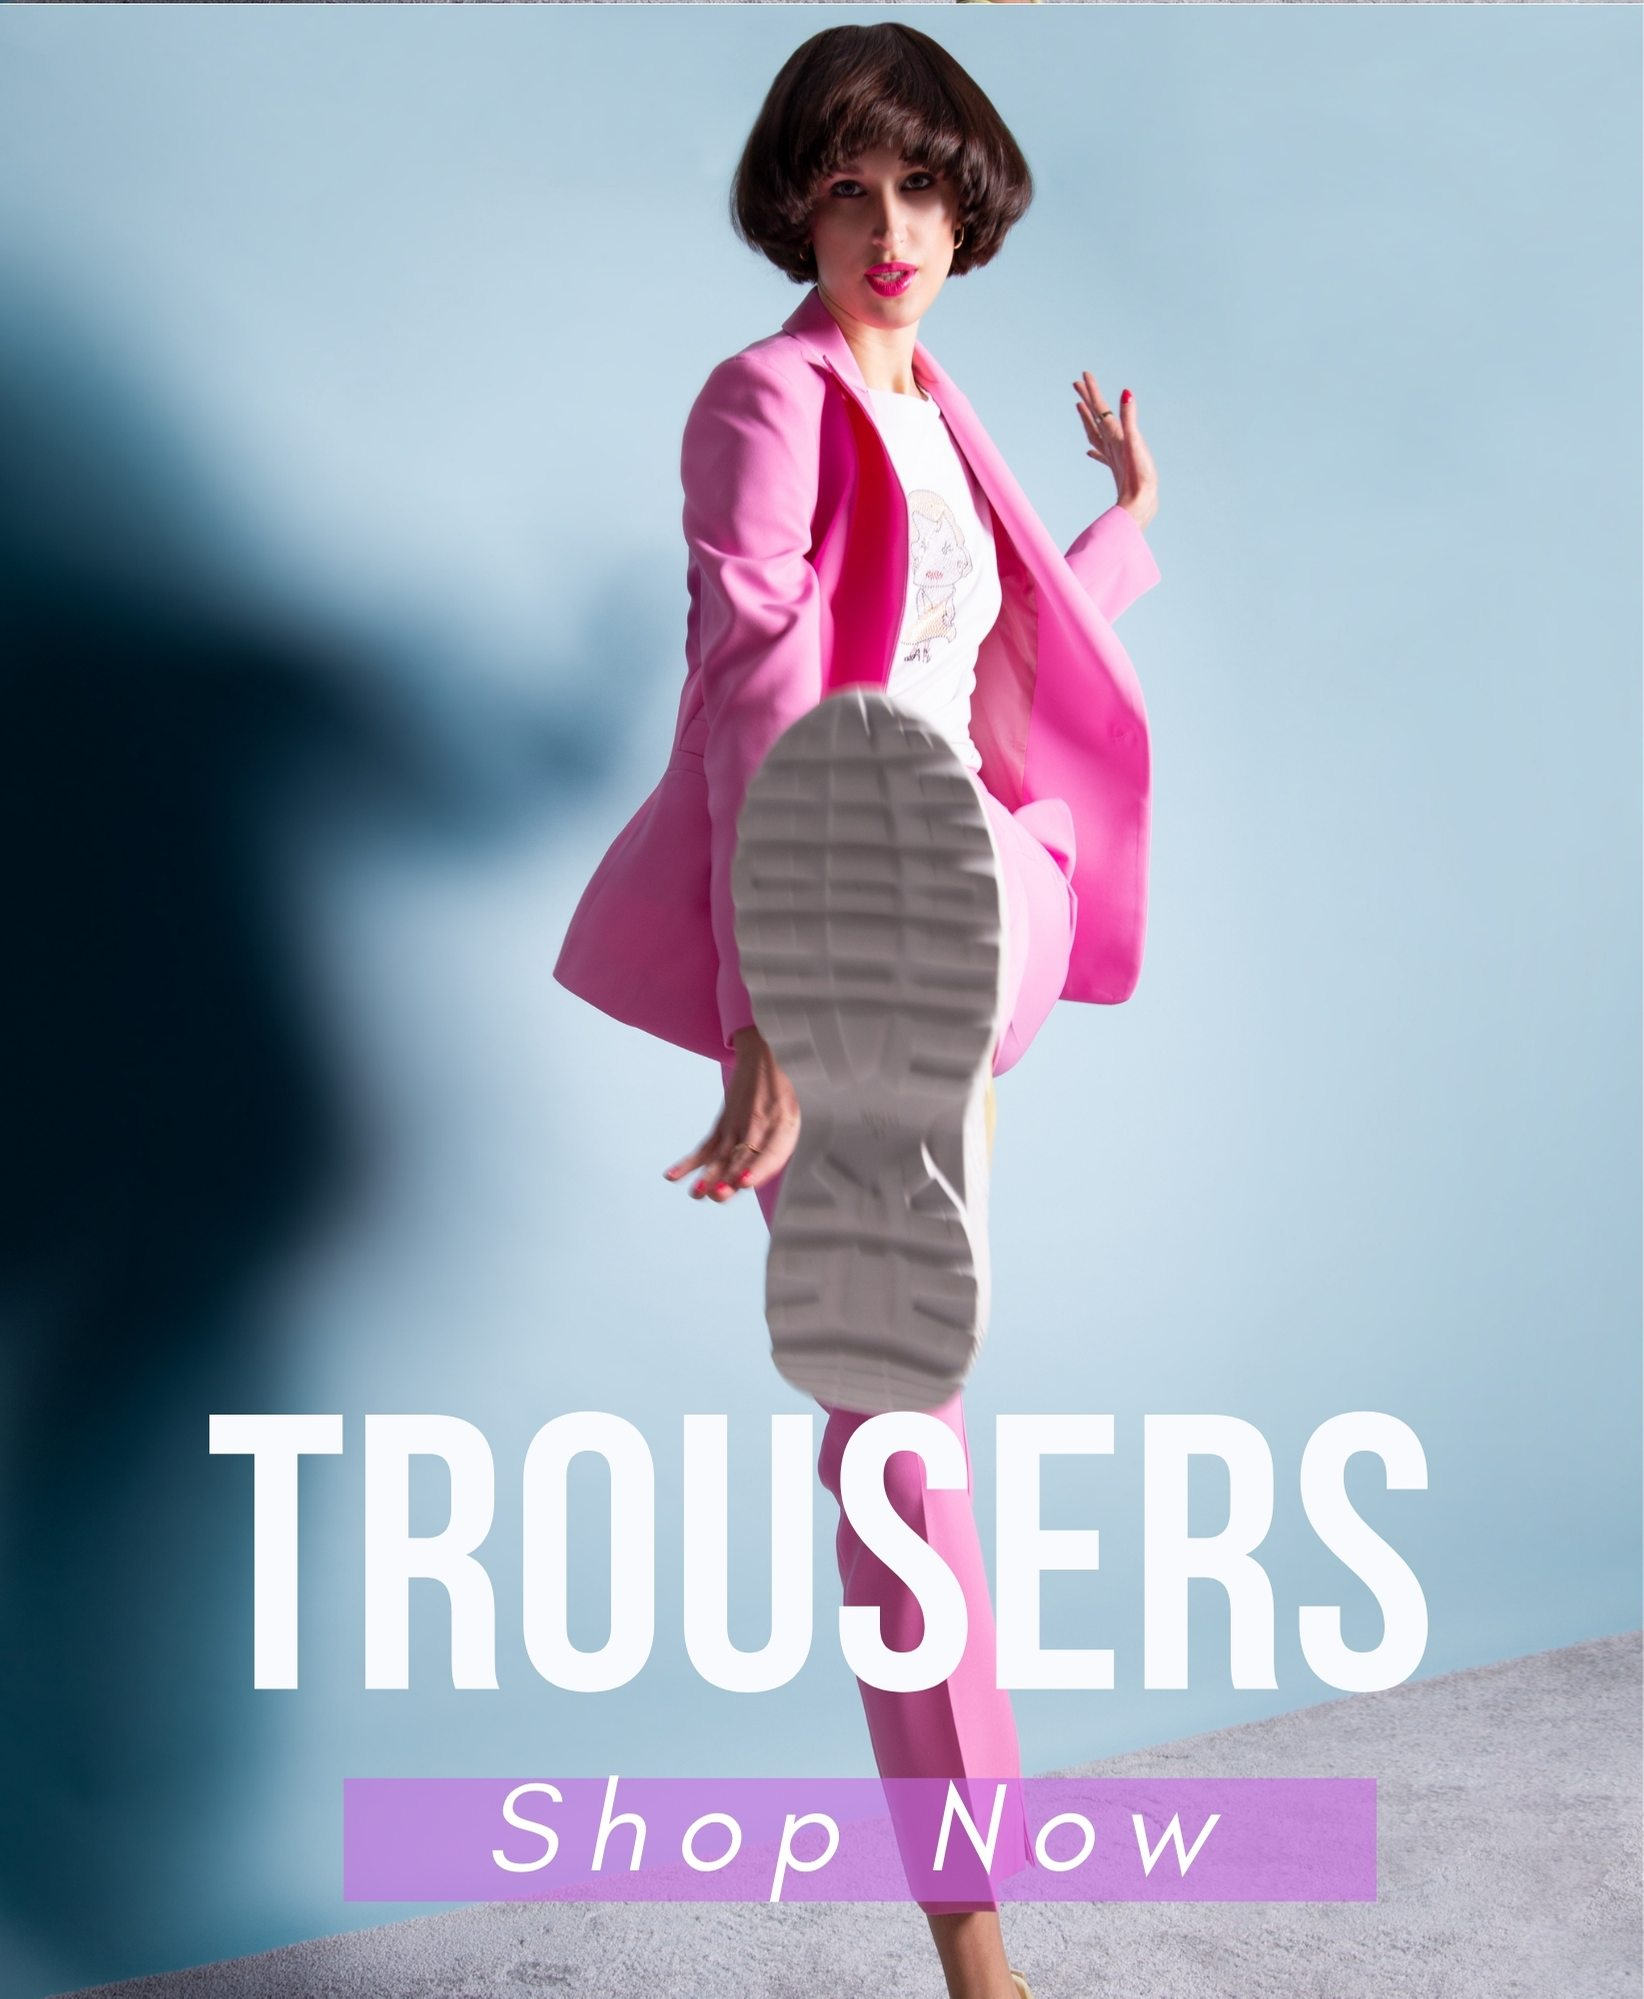 Trousers_Futur3 Fashion_Fashionable woman clothing